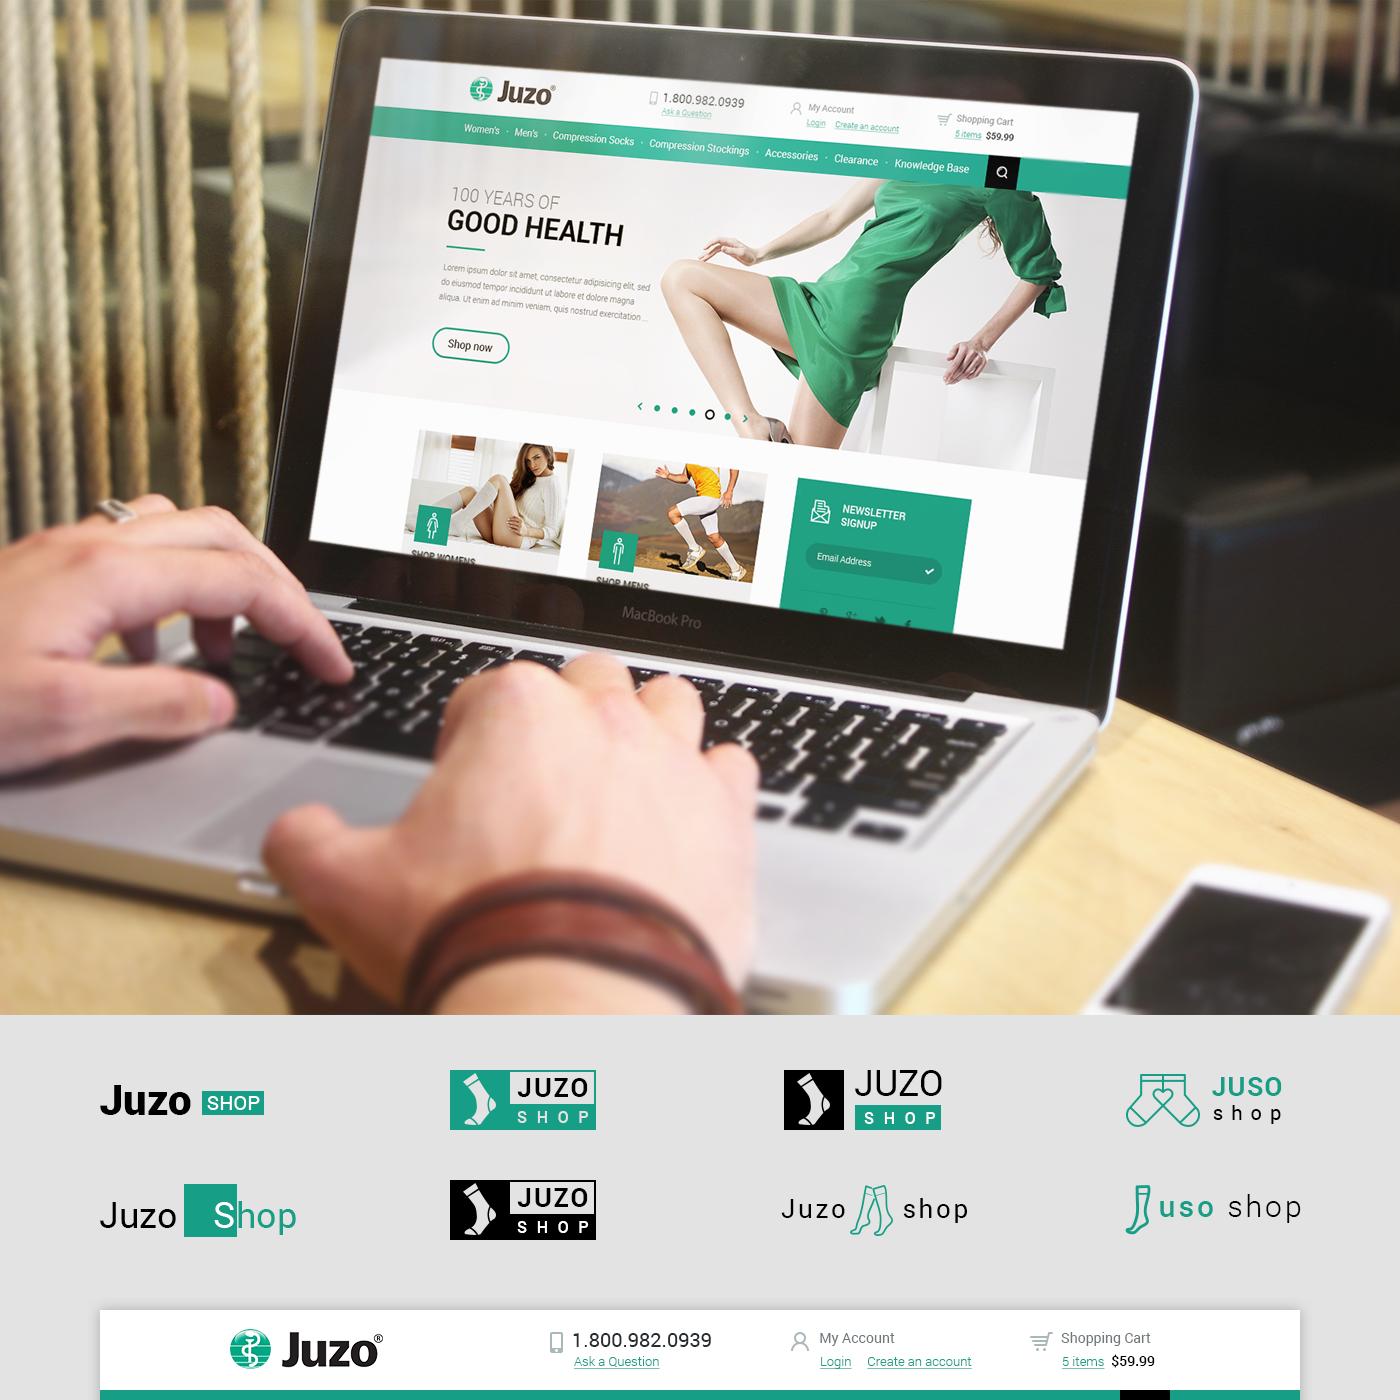 JuzoShop.com website design